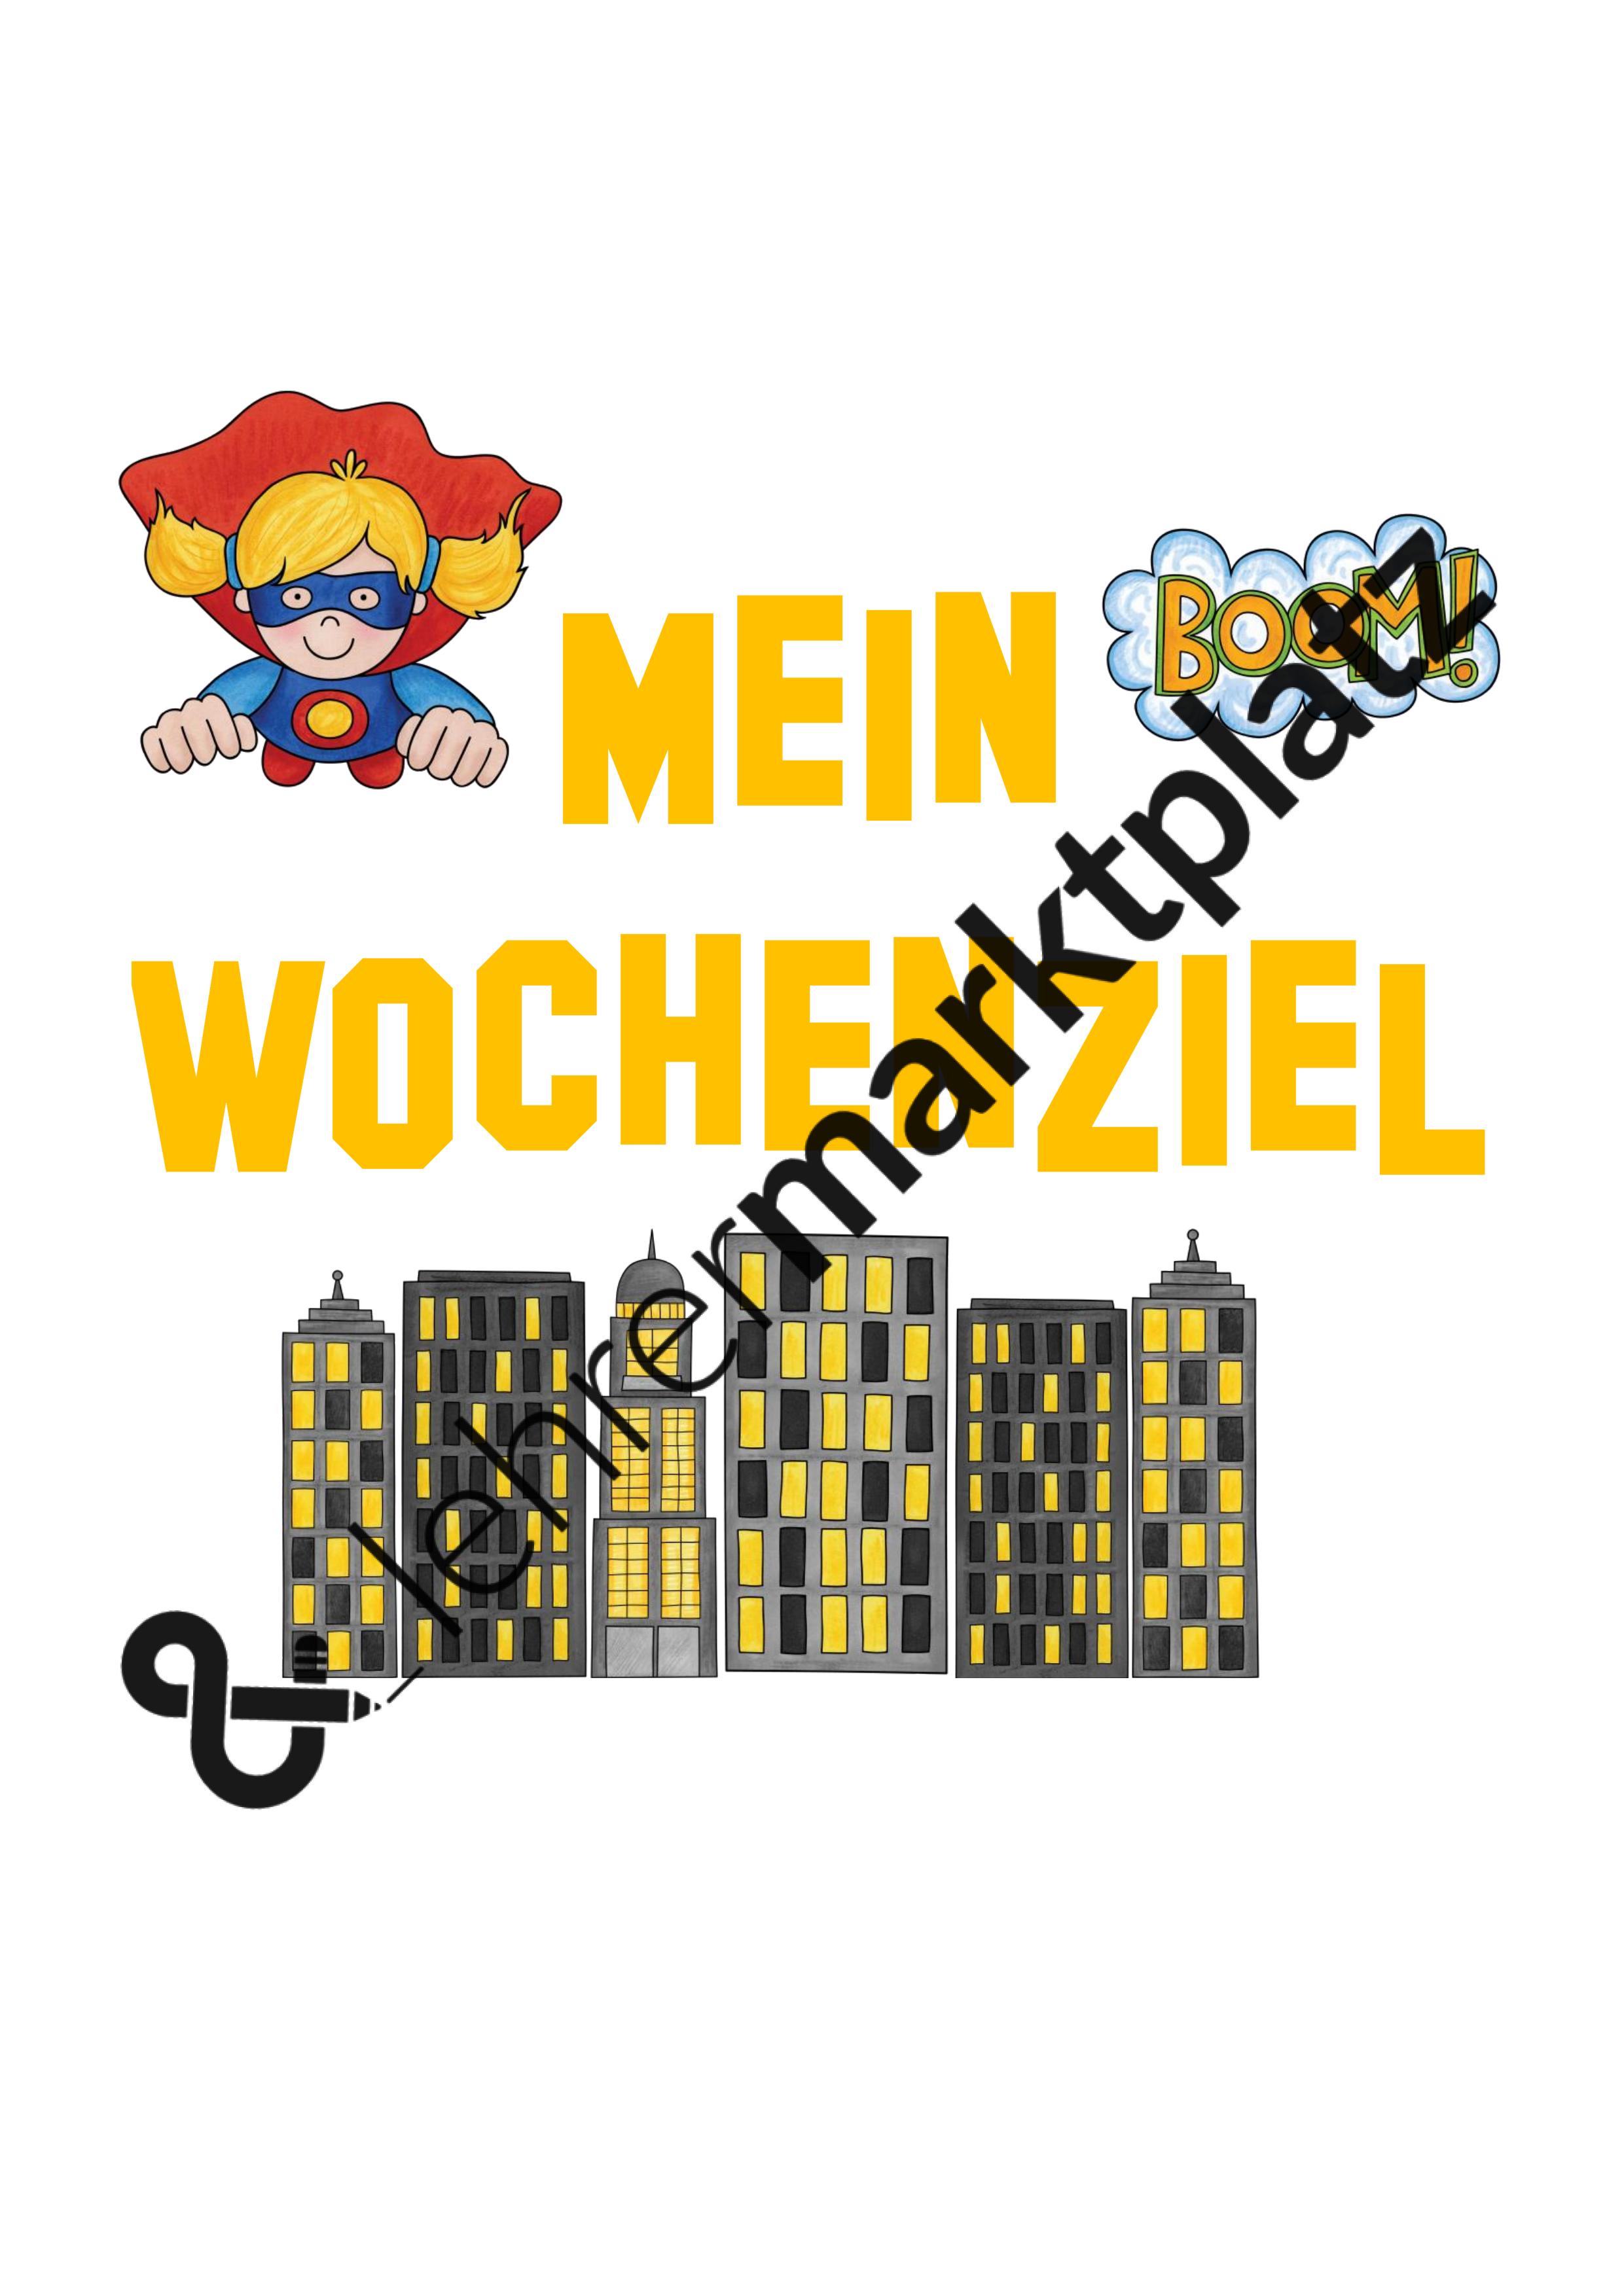 Wochenziel clipart graphic transparent download Mein Wochenziel Superhelden graphic transparent download